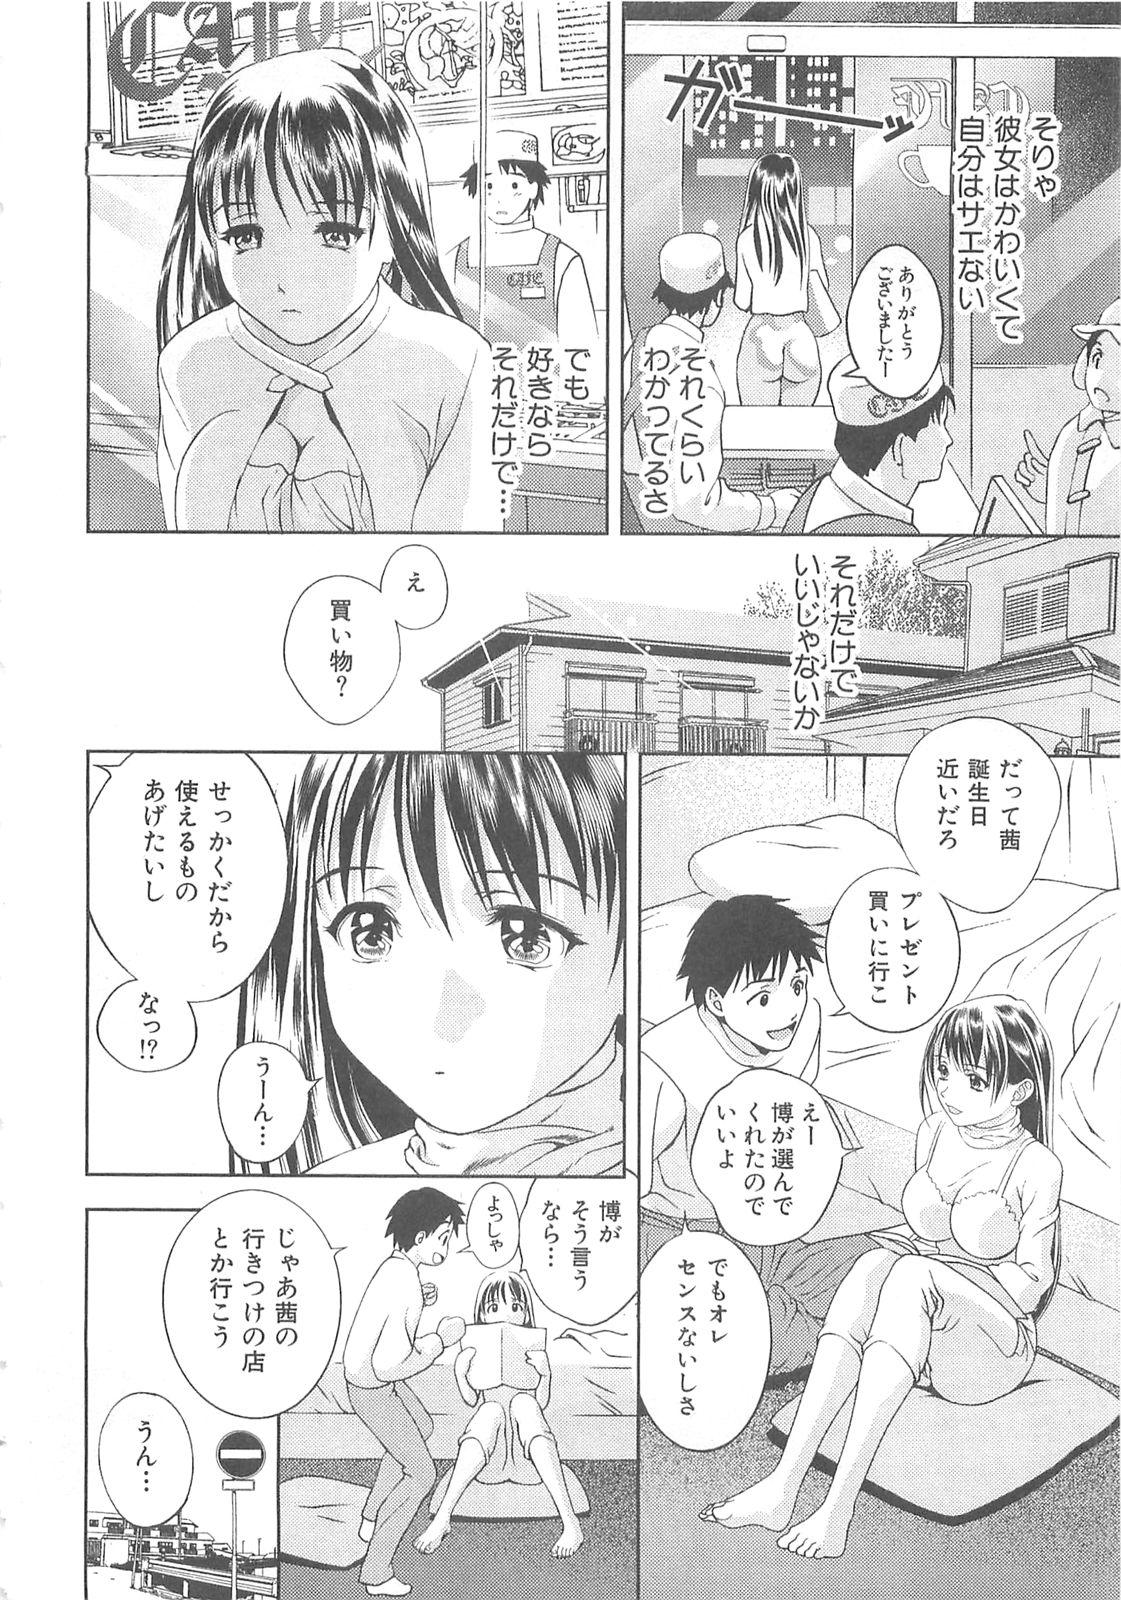 Tenshi no Kyuu - Angel's Pretty Hip 12